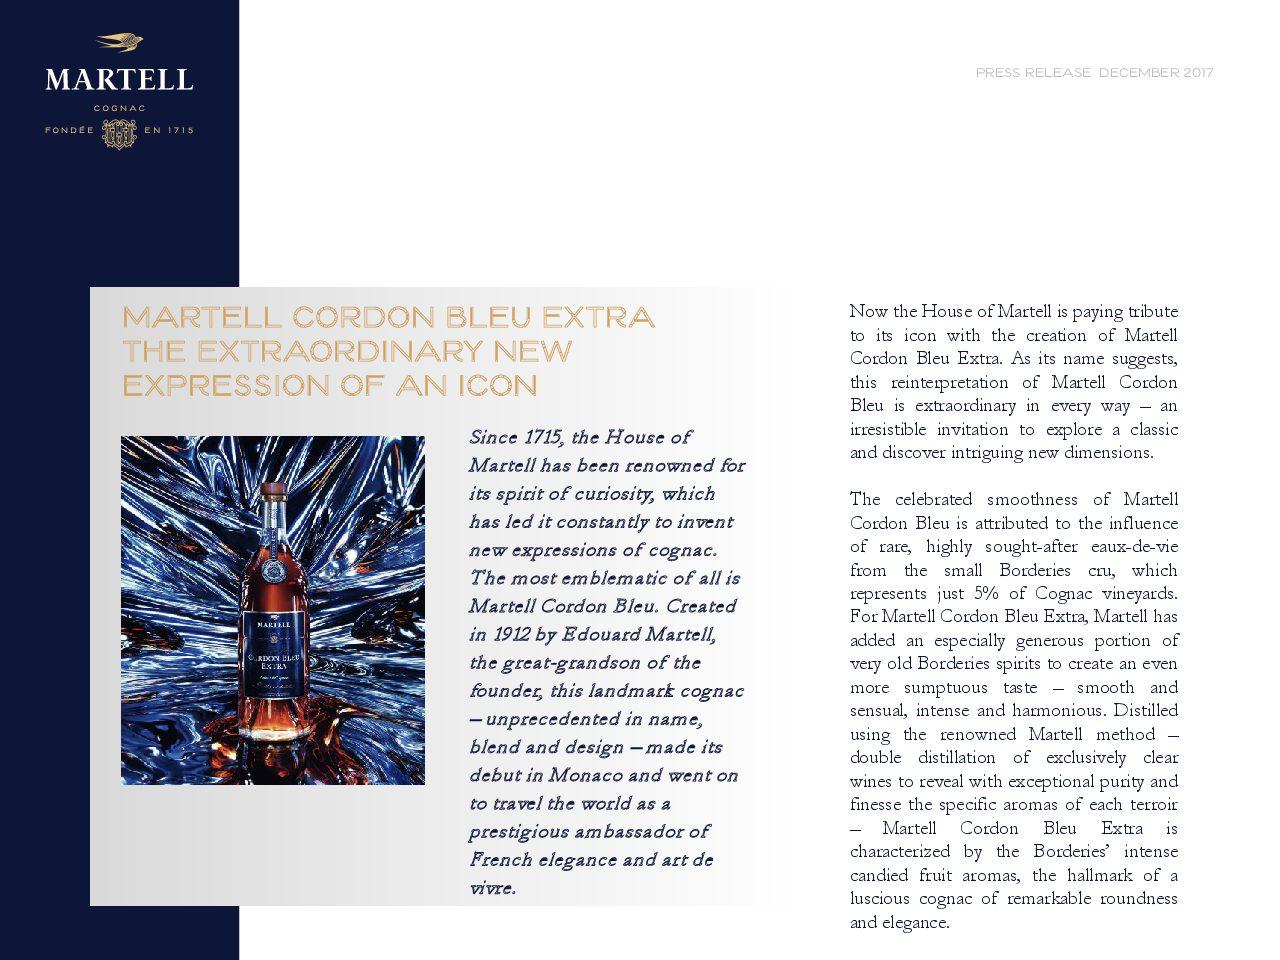 Martell Cordon Bleu Extra Press Release